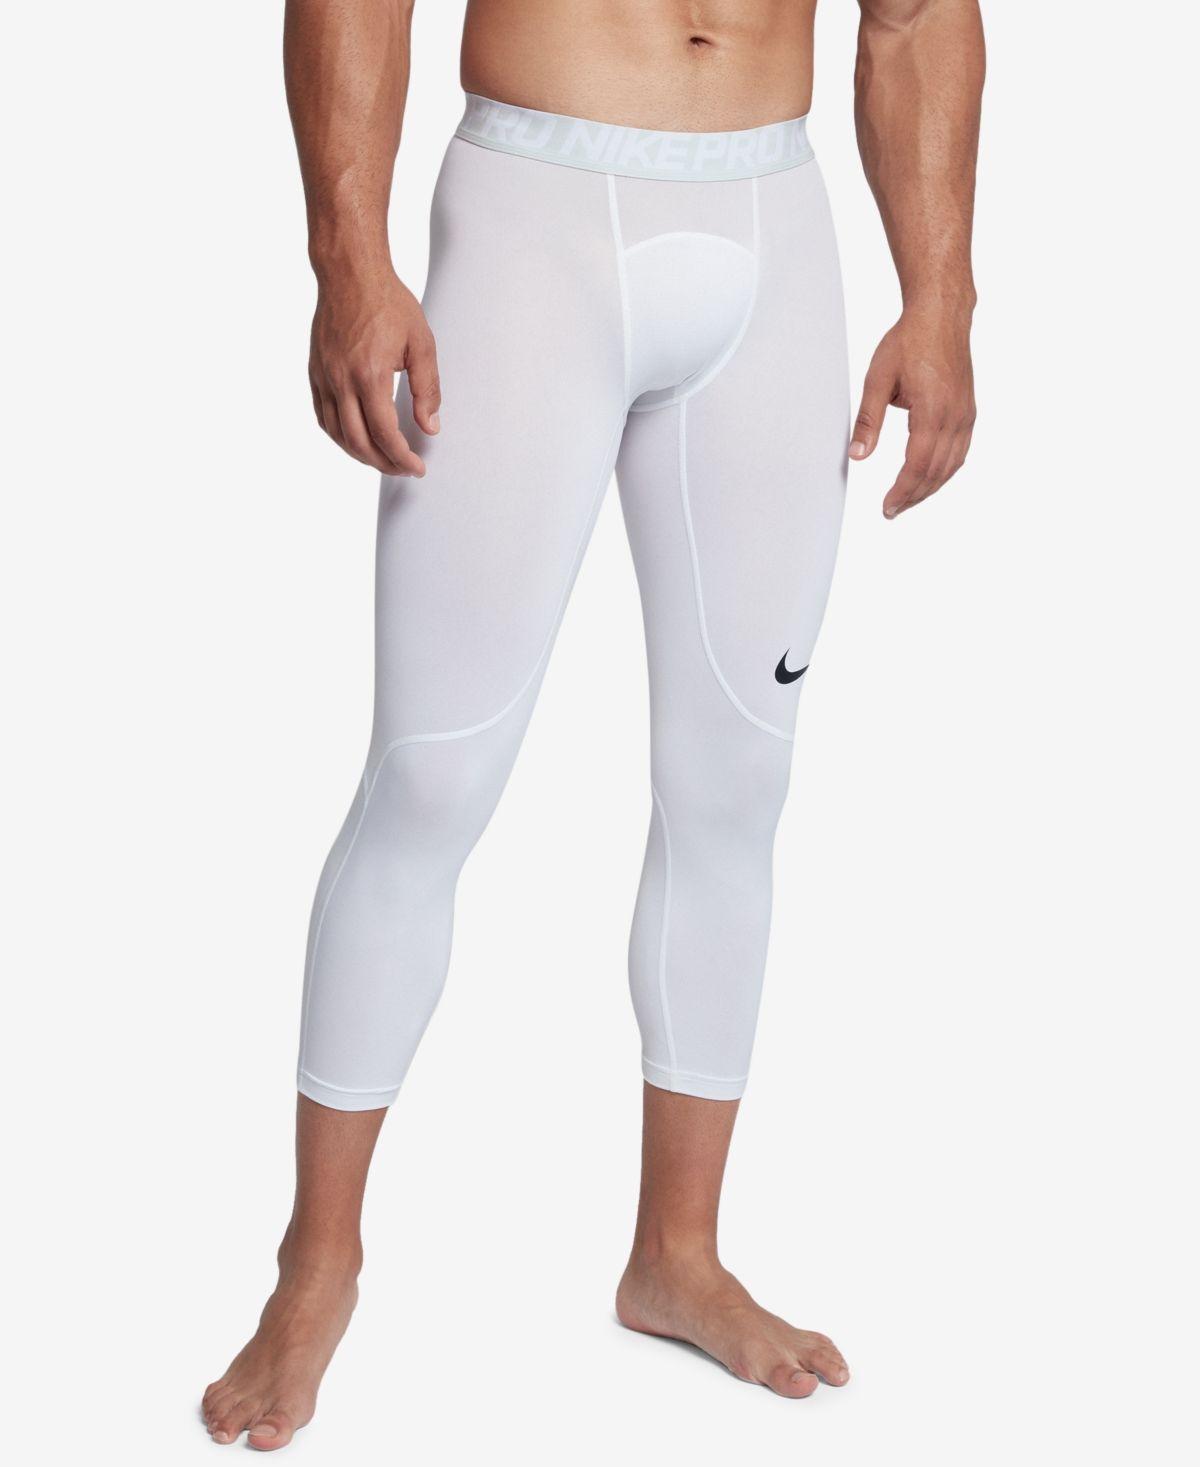 Nike Pro  Men/'s Utility Tights S M L XL Black Gray Gym Running New